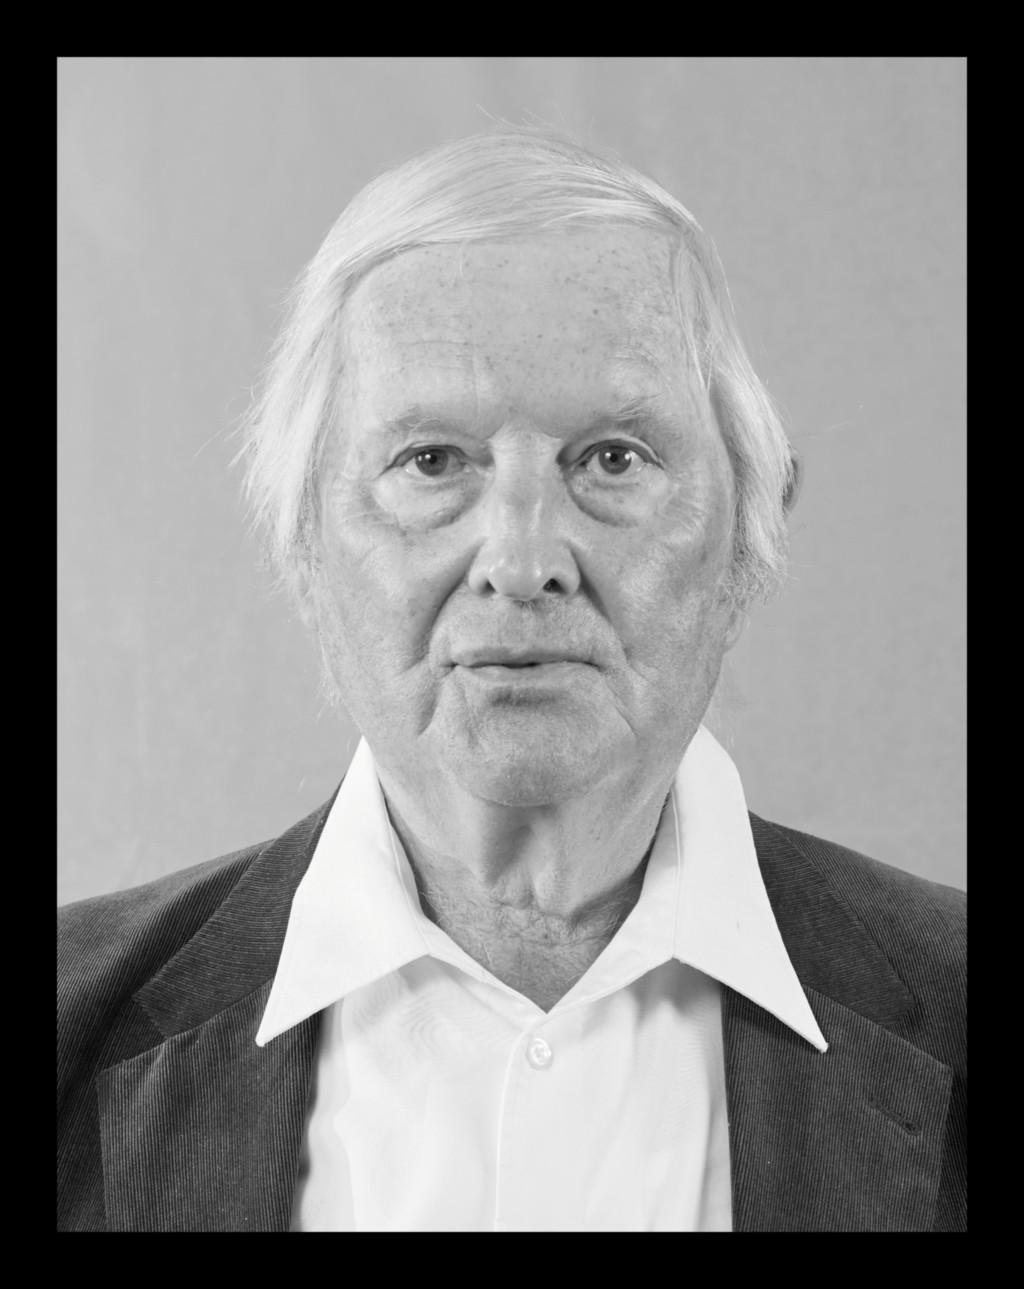 Hans-Dieter Morich